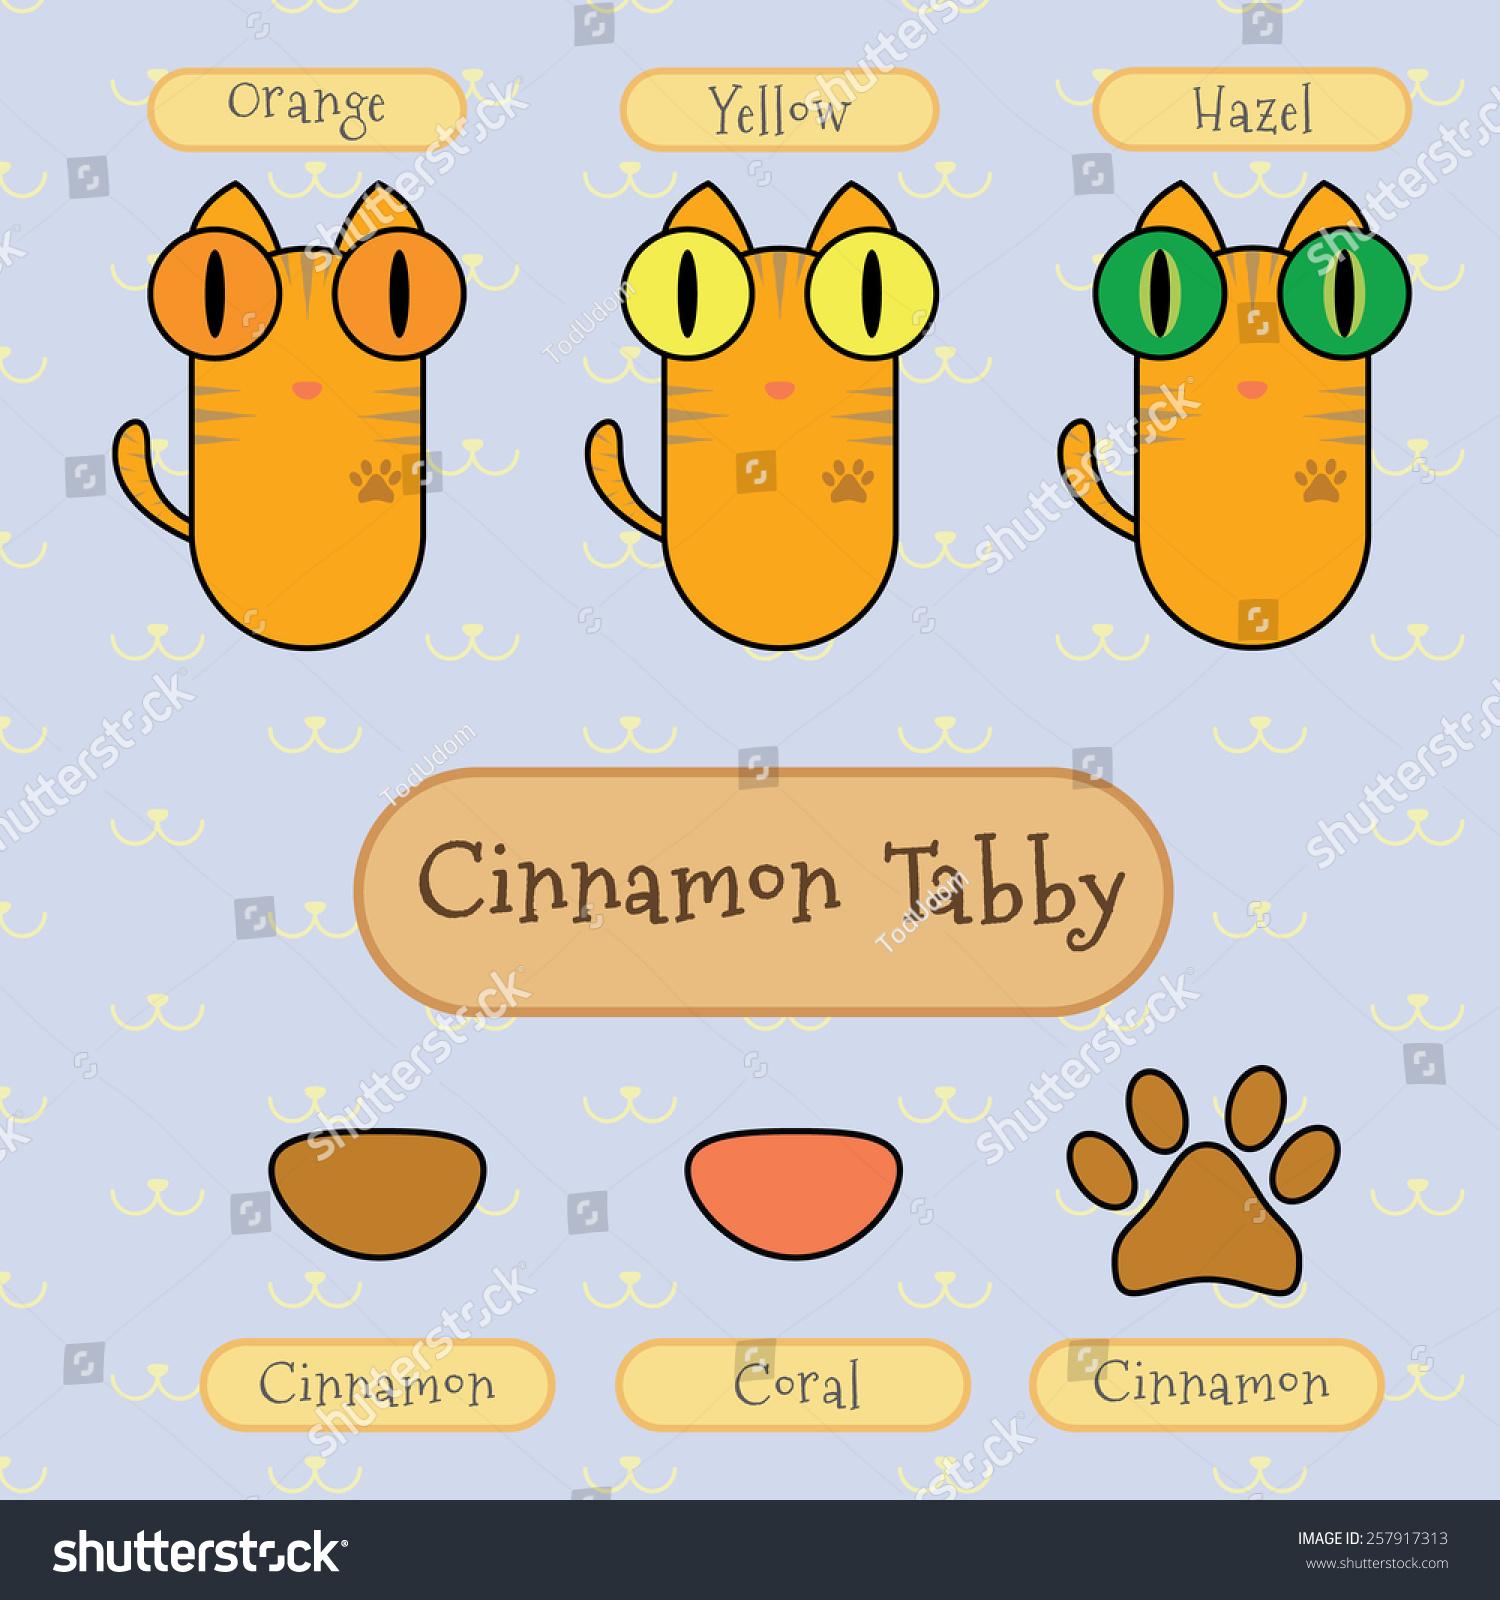 tabby cat eye color   Best Cat Cute Pictures, Meme ...